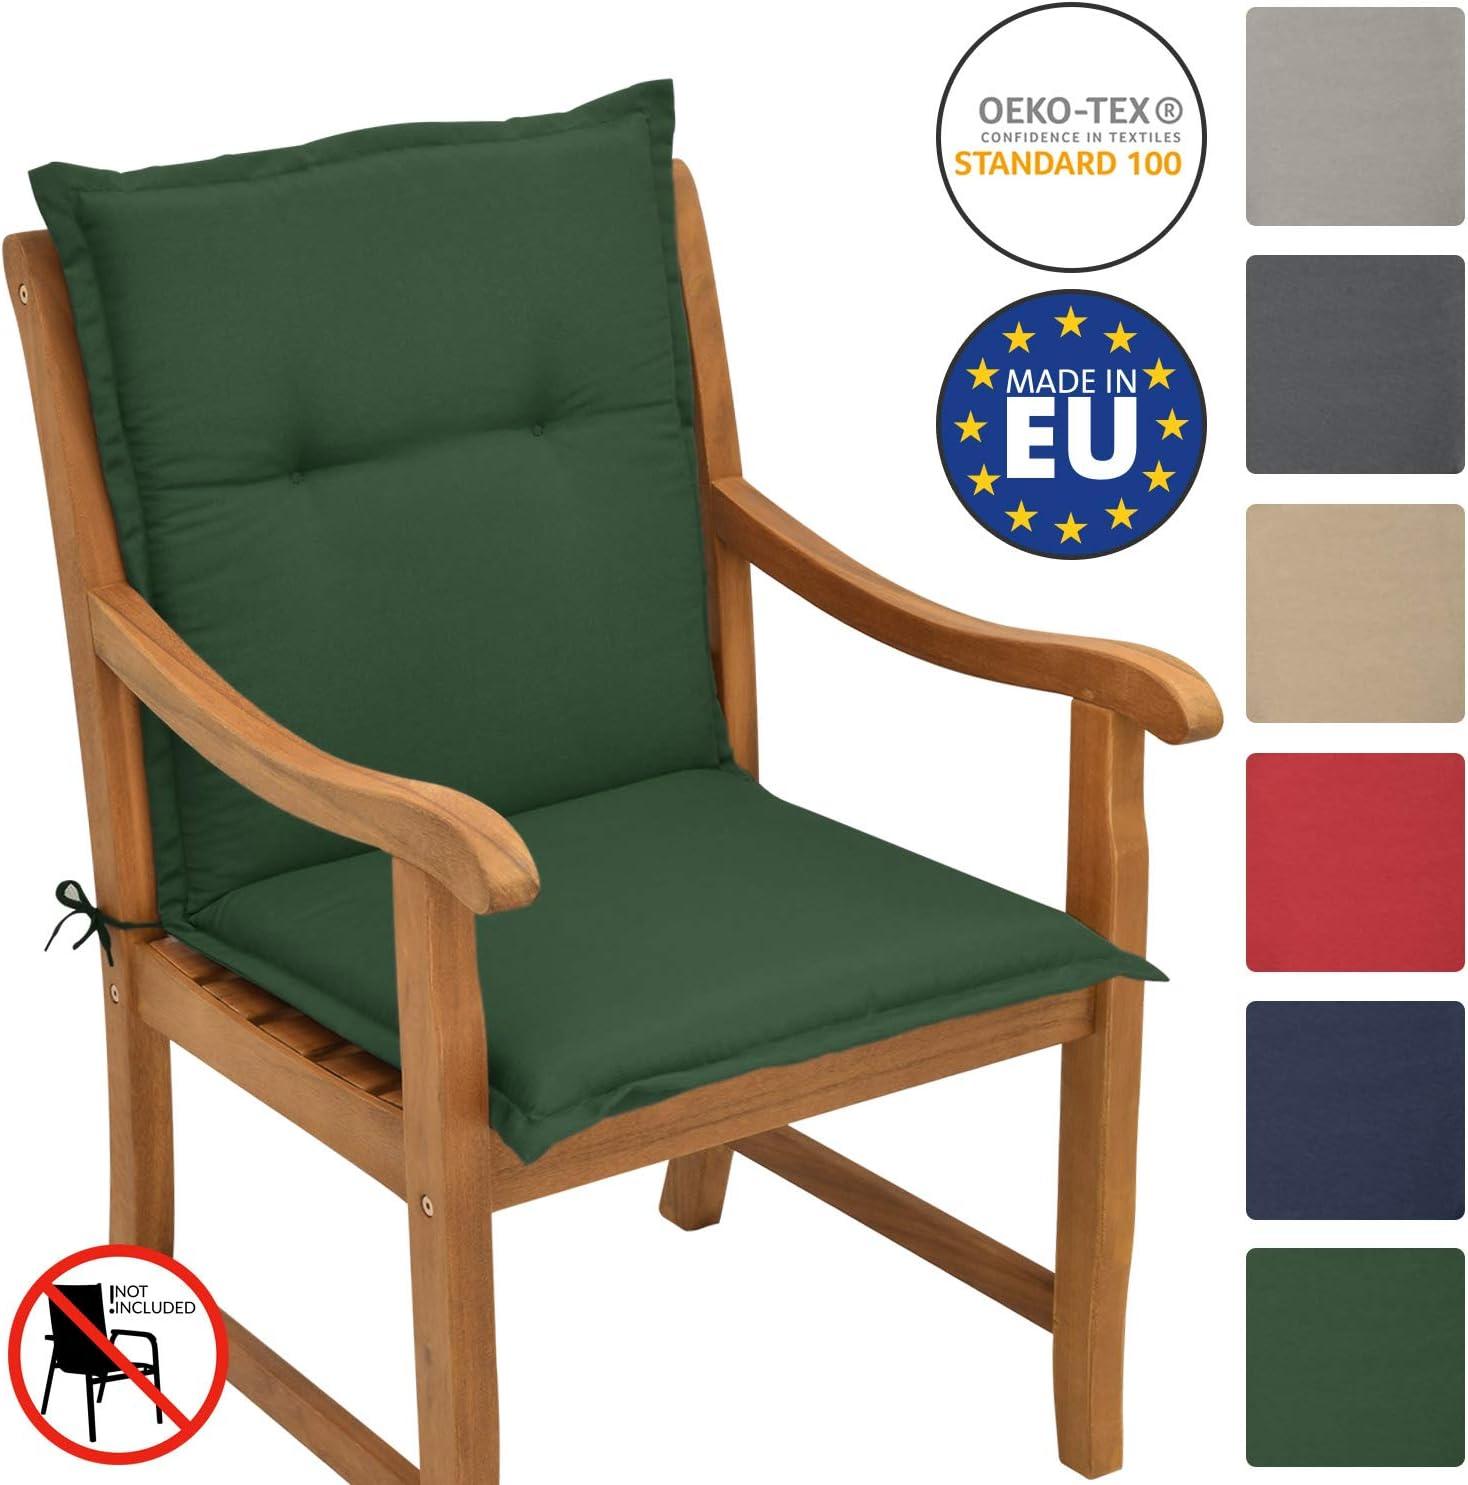 Beautissu Garden Chair Cushion Seat Pad Set of 6 Sunny NL 100 x 50 x 6 cm Blue